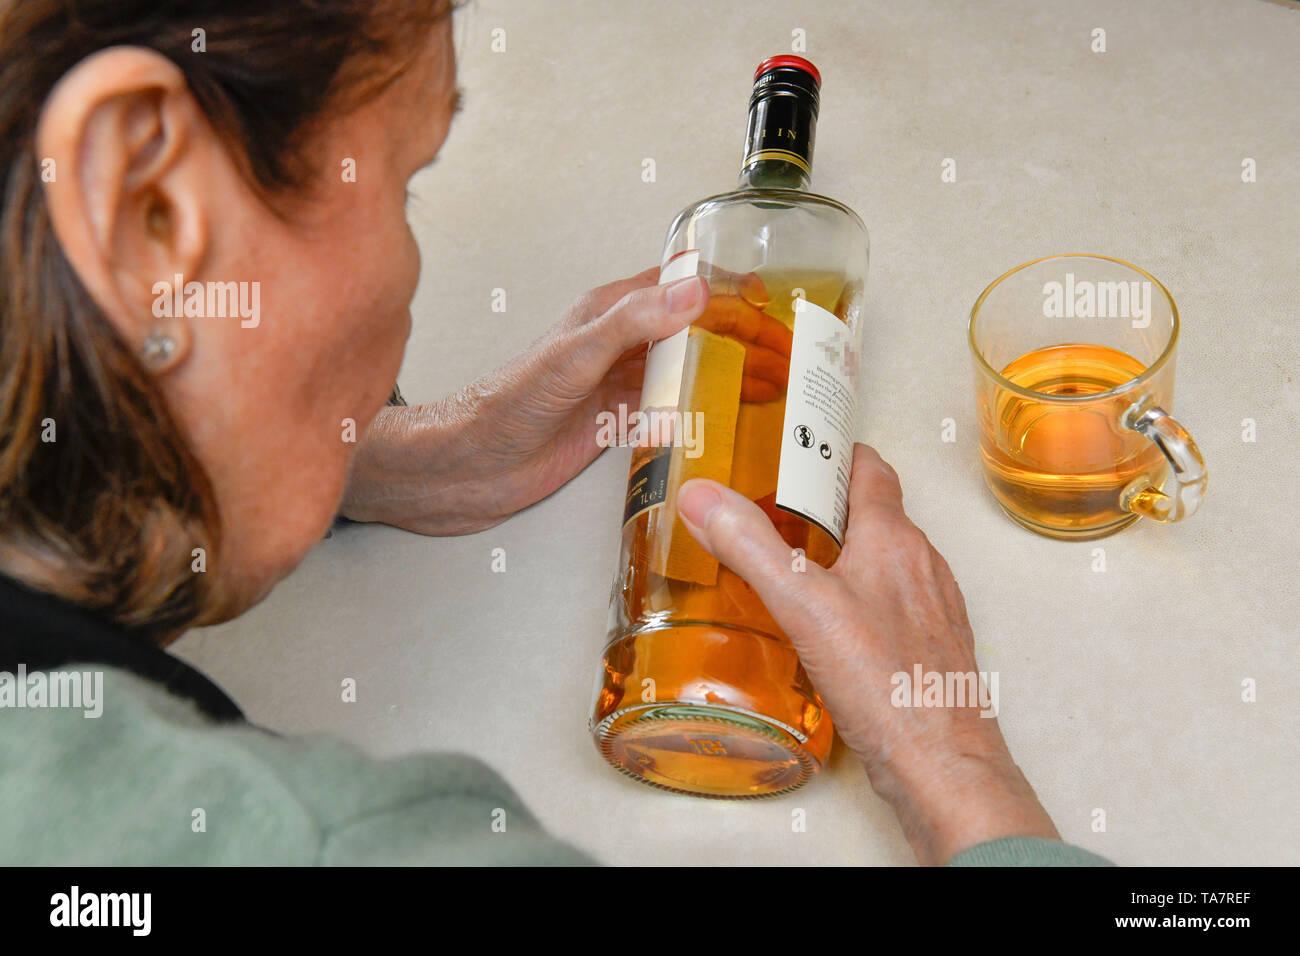 Put symbolic photo, alcohol, senior, Gestelltes Symbolfoto, Alkohol, Seniorin - Stock Image